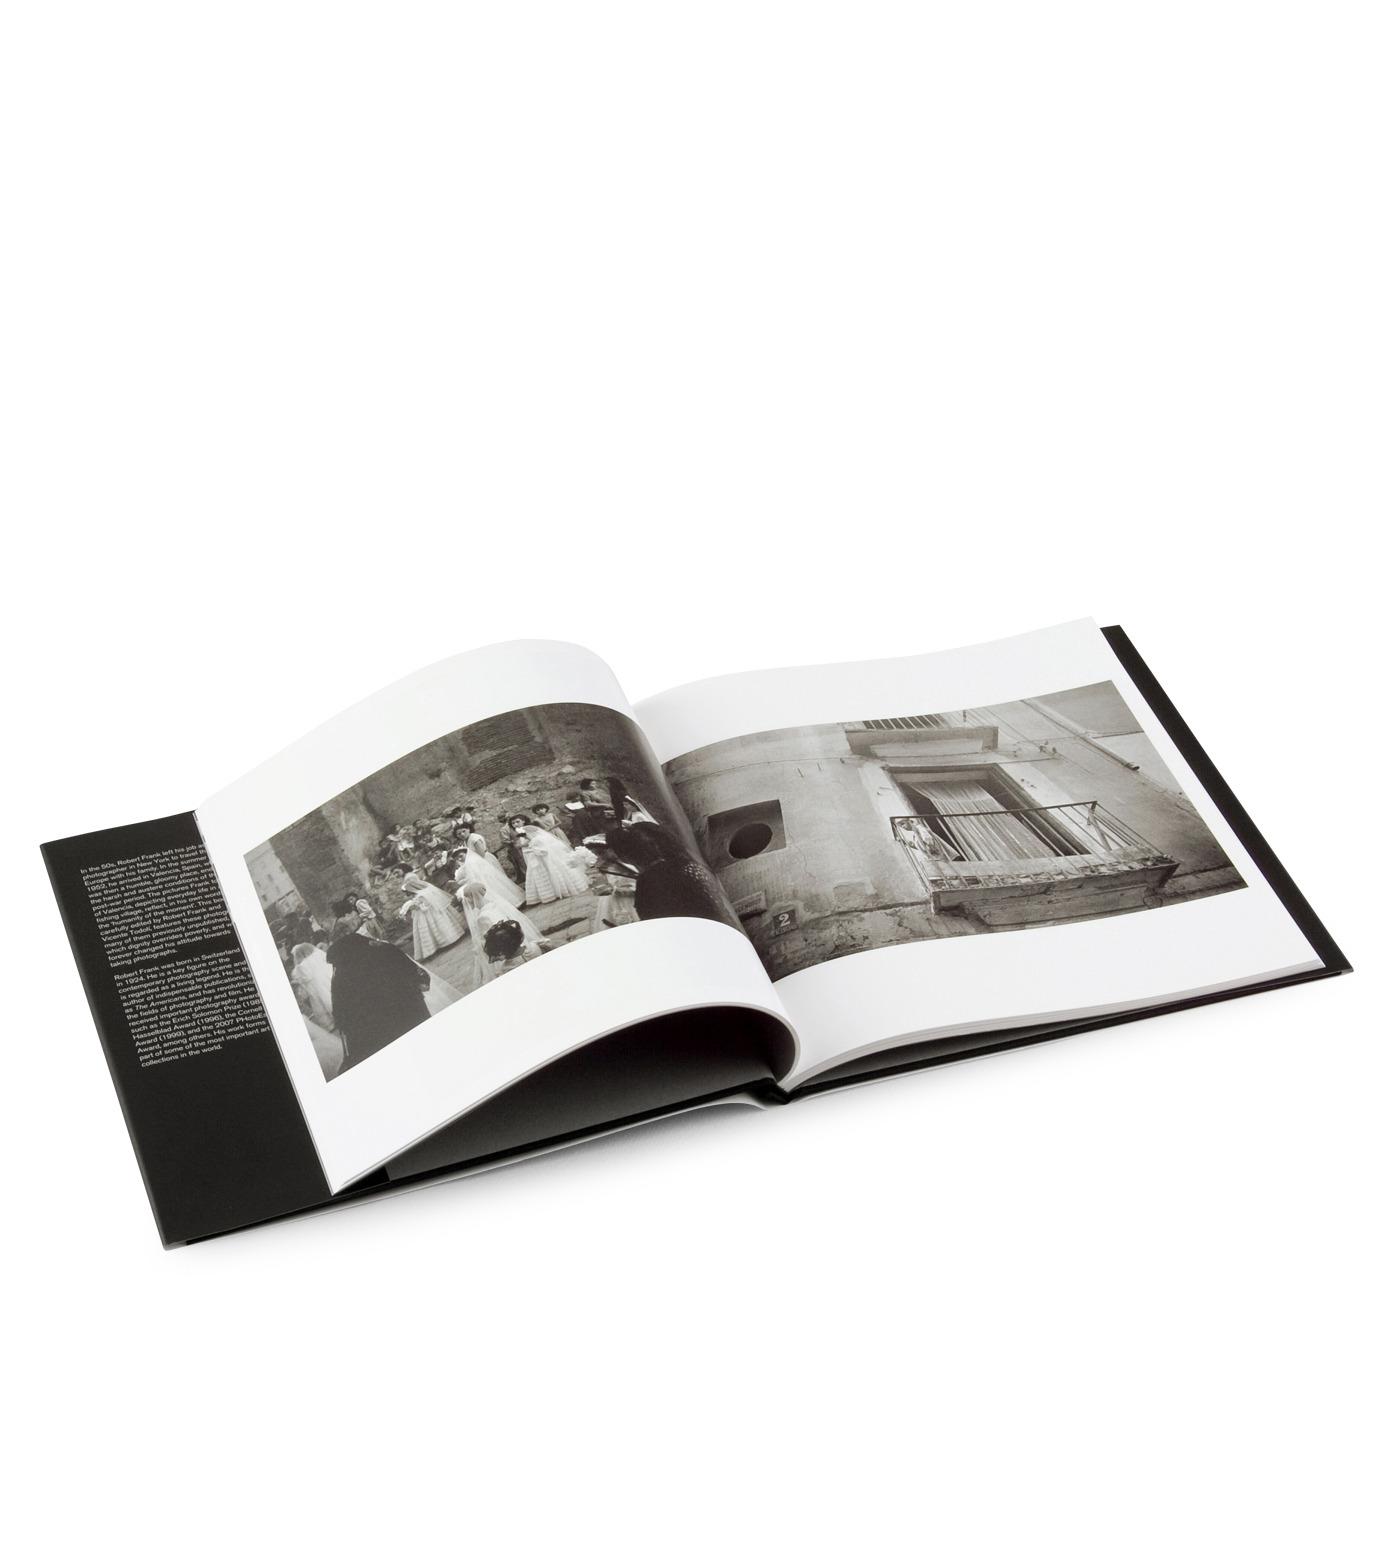 ArtBook(アートブック)のRobert Frank: Valencia 1952.-NONE(インテリア/OTHER-GOODS/interior/OTHER-GOODS)-86930-502-8-0 拡大詳細画像2